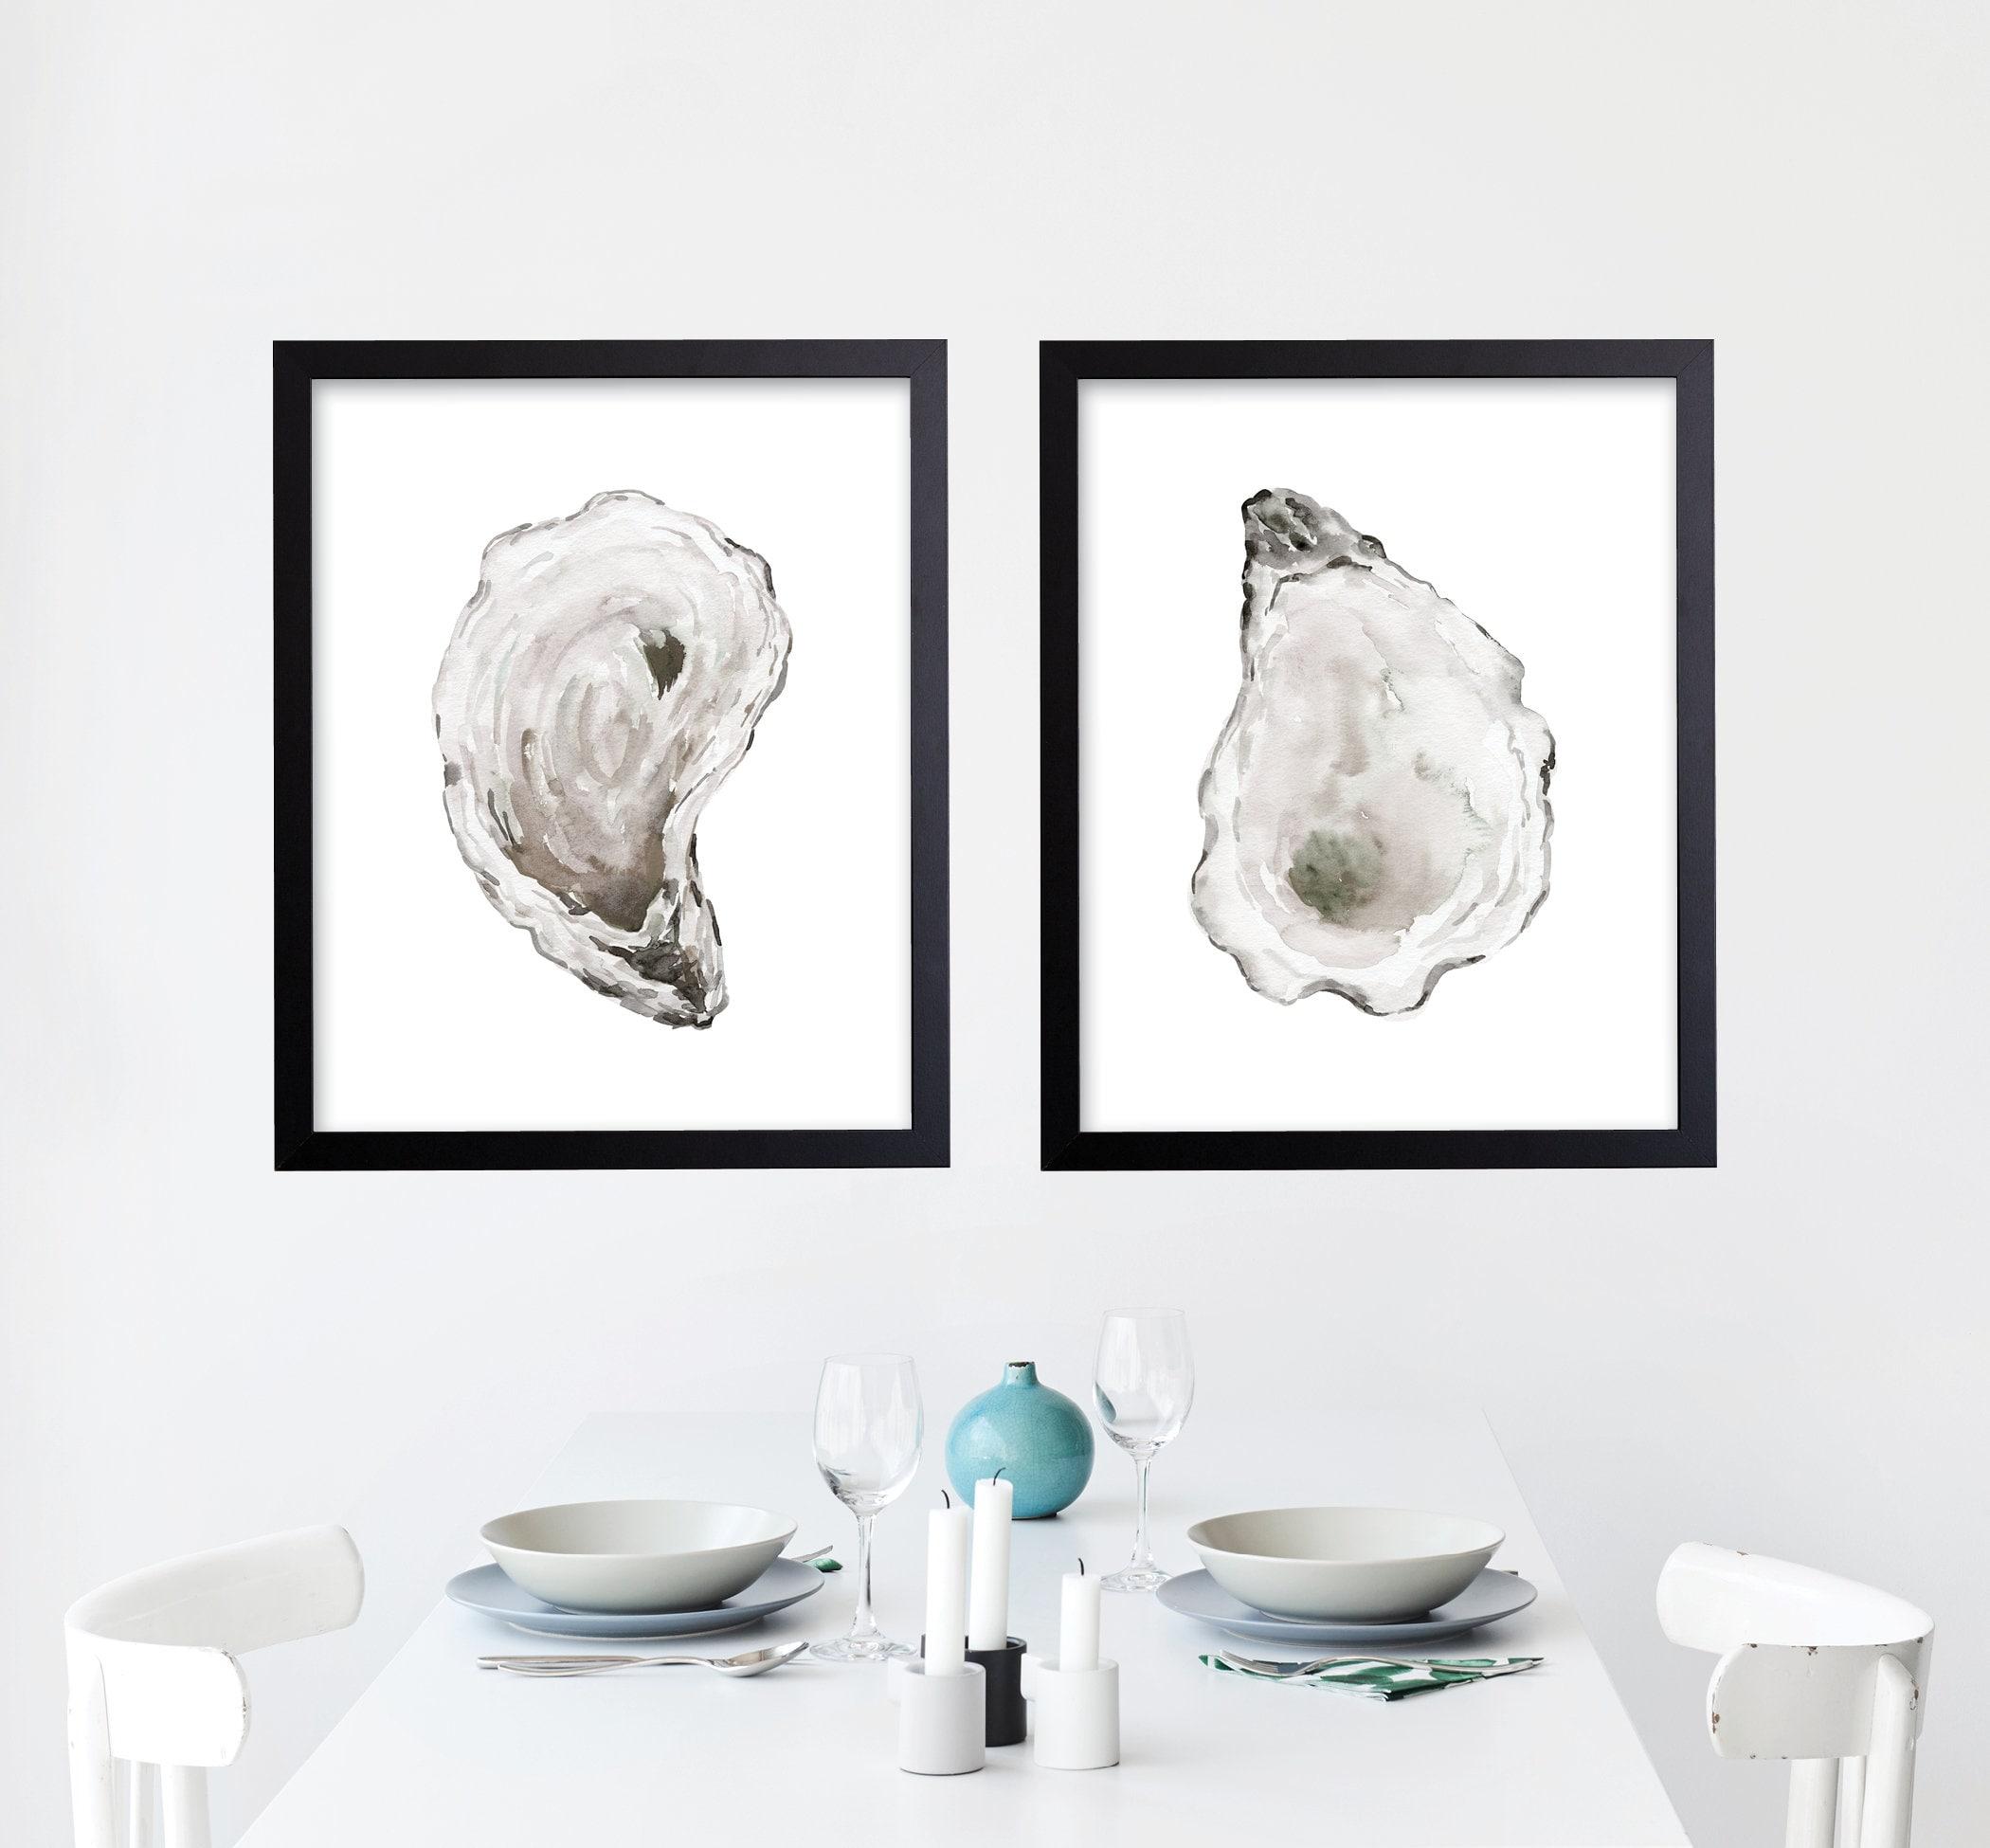 Watercolor Oyster Shell Prints Beach House Decor Coastal Art Seaside Wall Kitchen Dining Room Bath